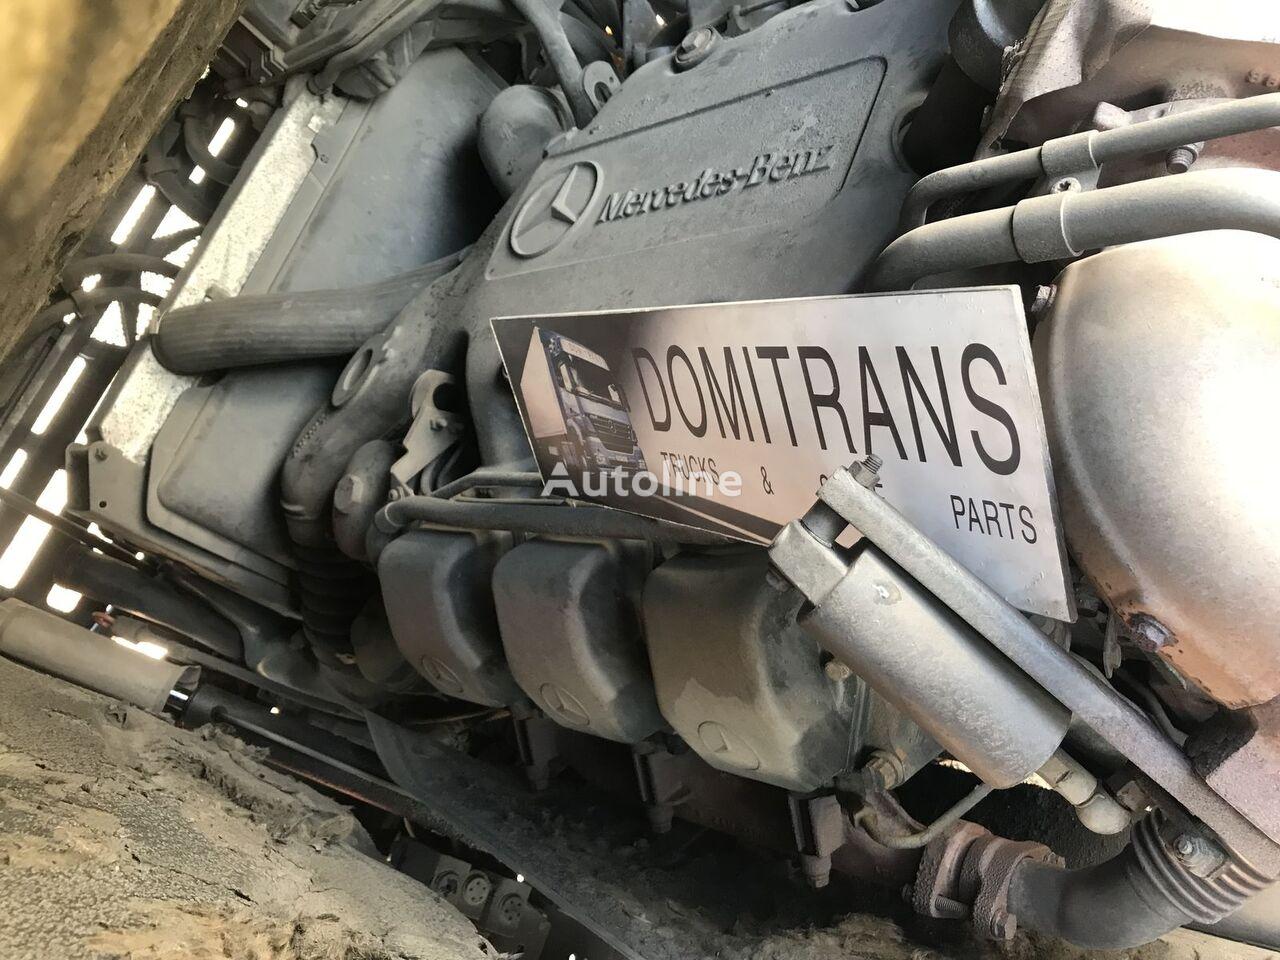 двигатель MERCEDES-BENZ ACTROS OM501EURO2,3 1840,1843 MP1 для тягача MERCEDES-BENZ